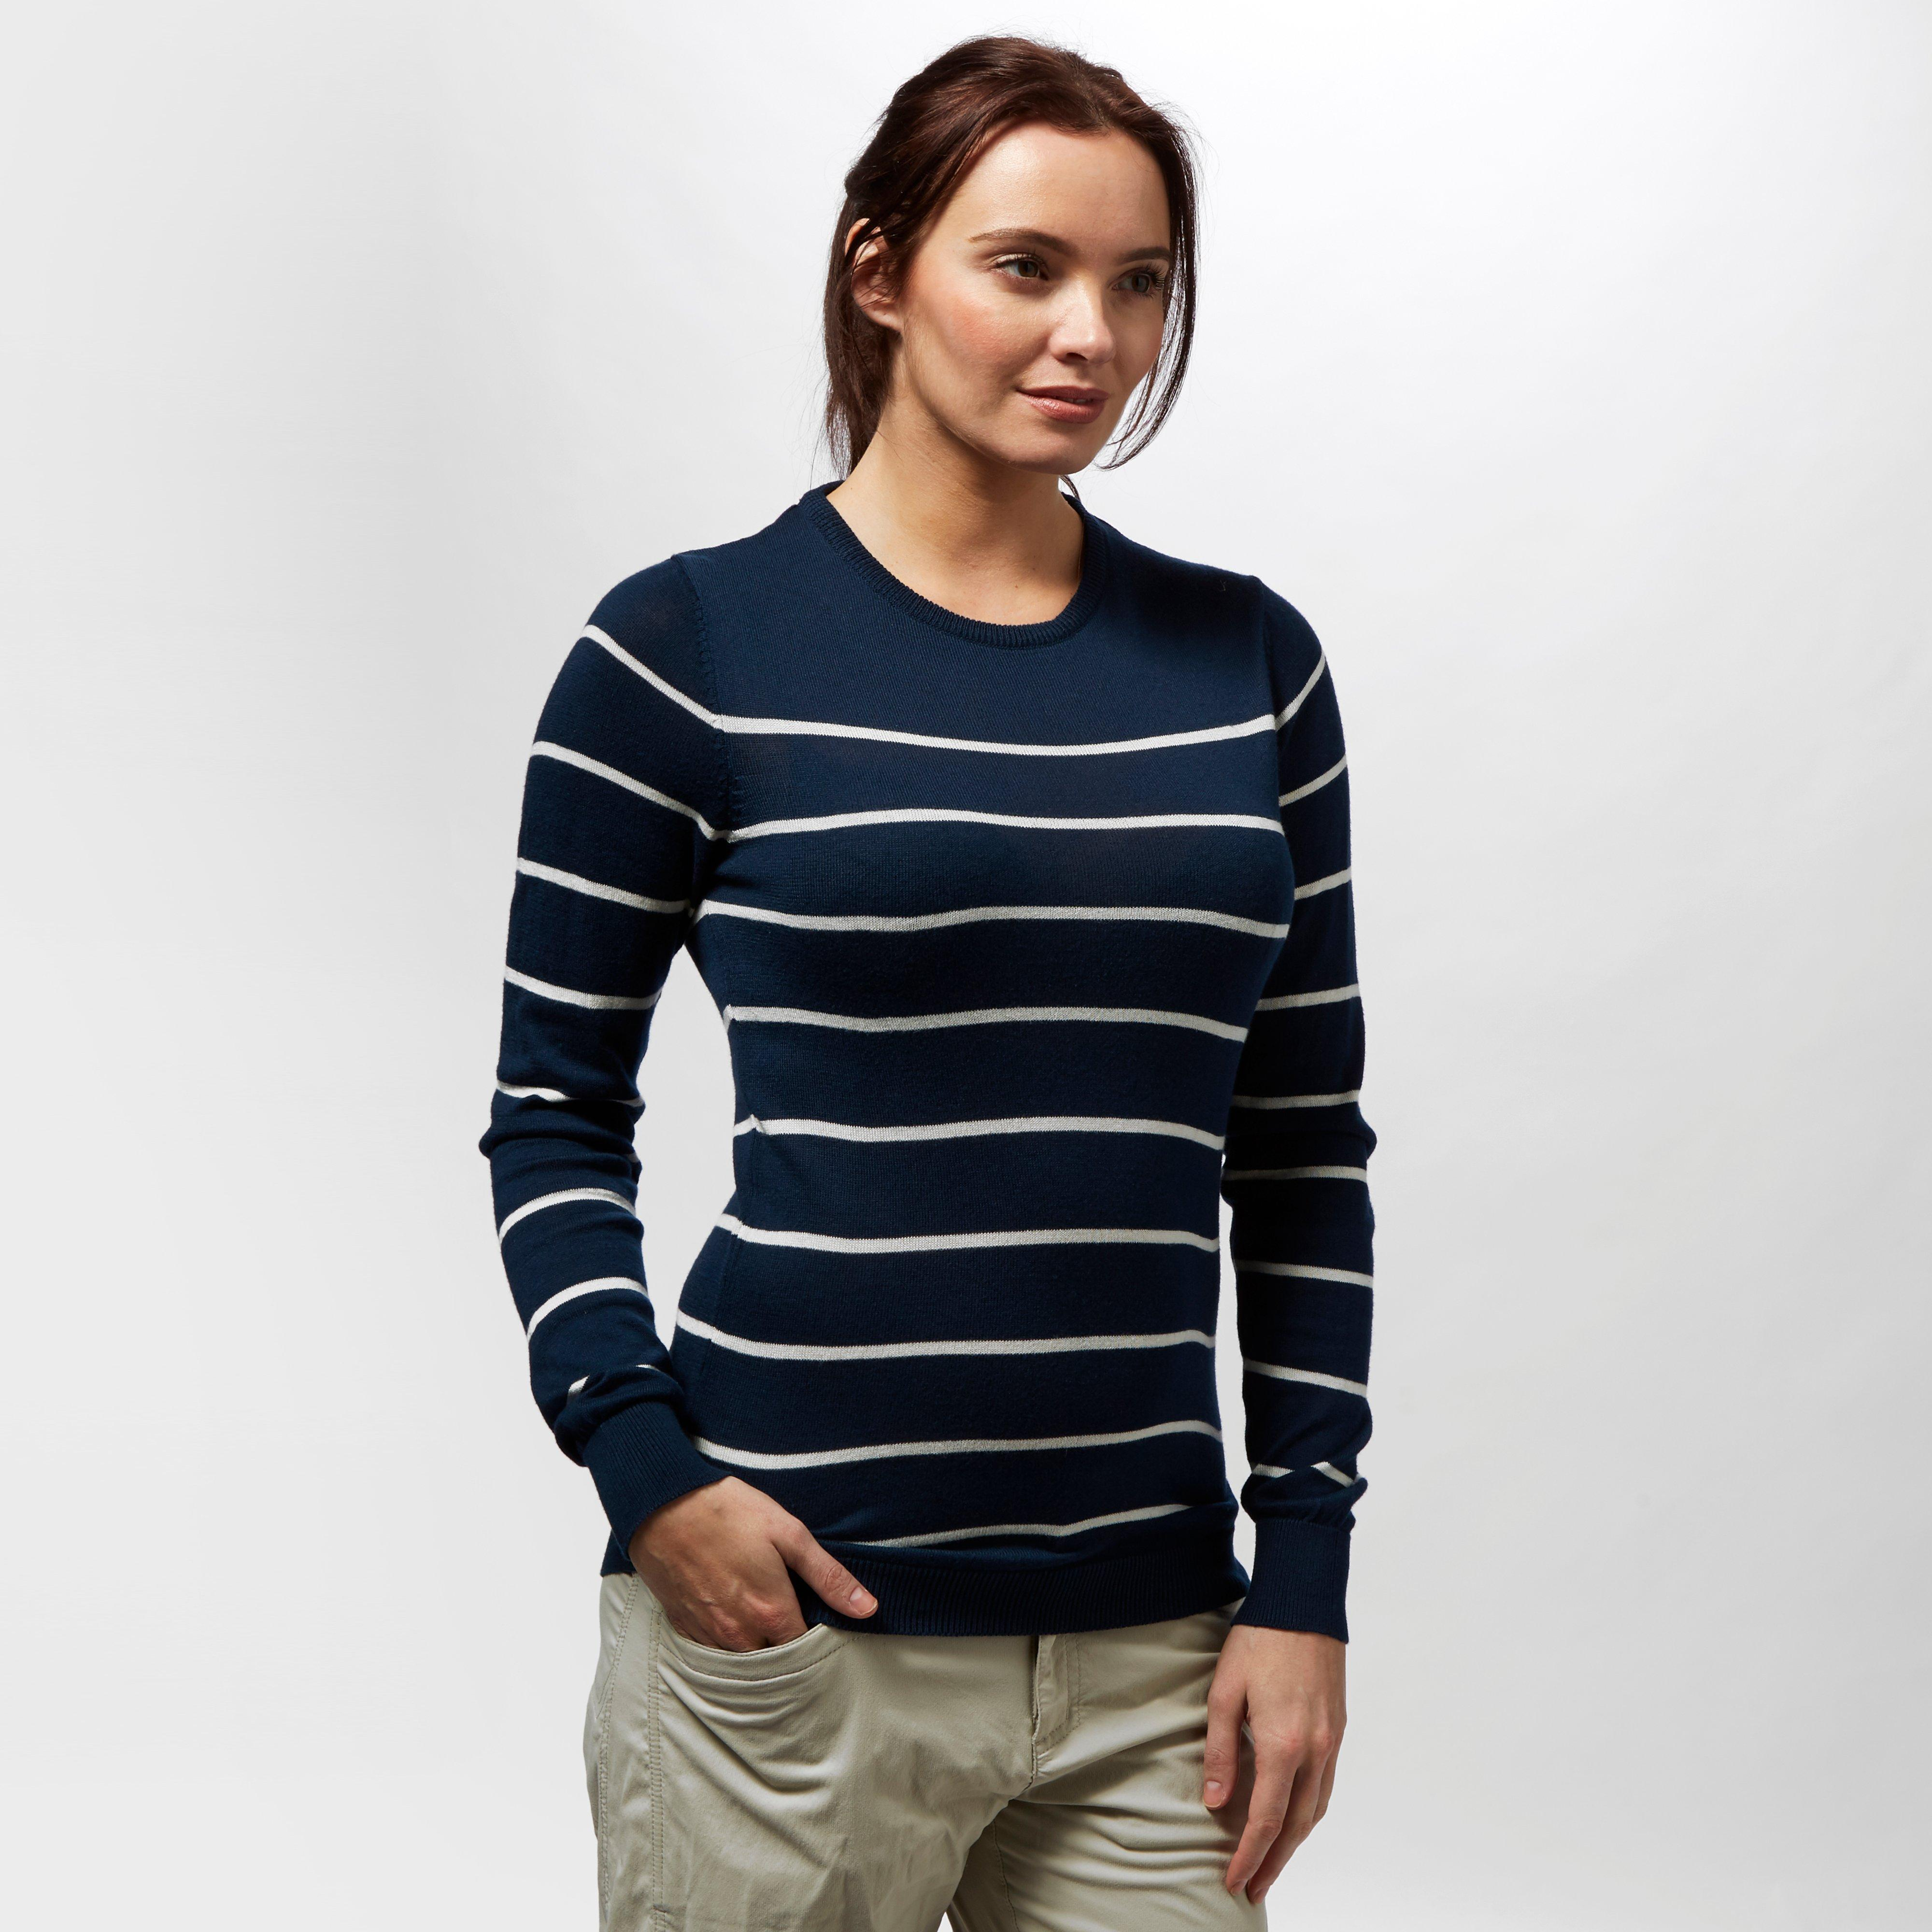 Brakeburn Brakeburn Womens Stripe Knit Jumper - Navy, Navy